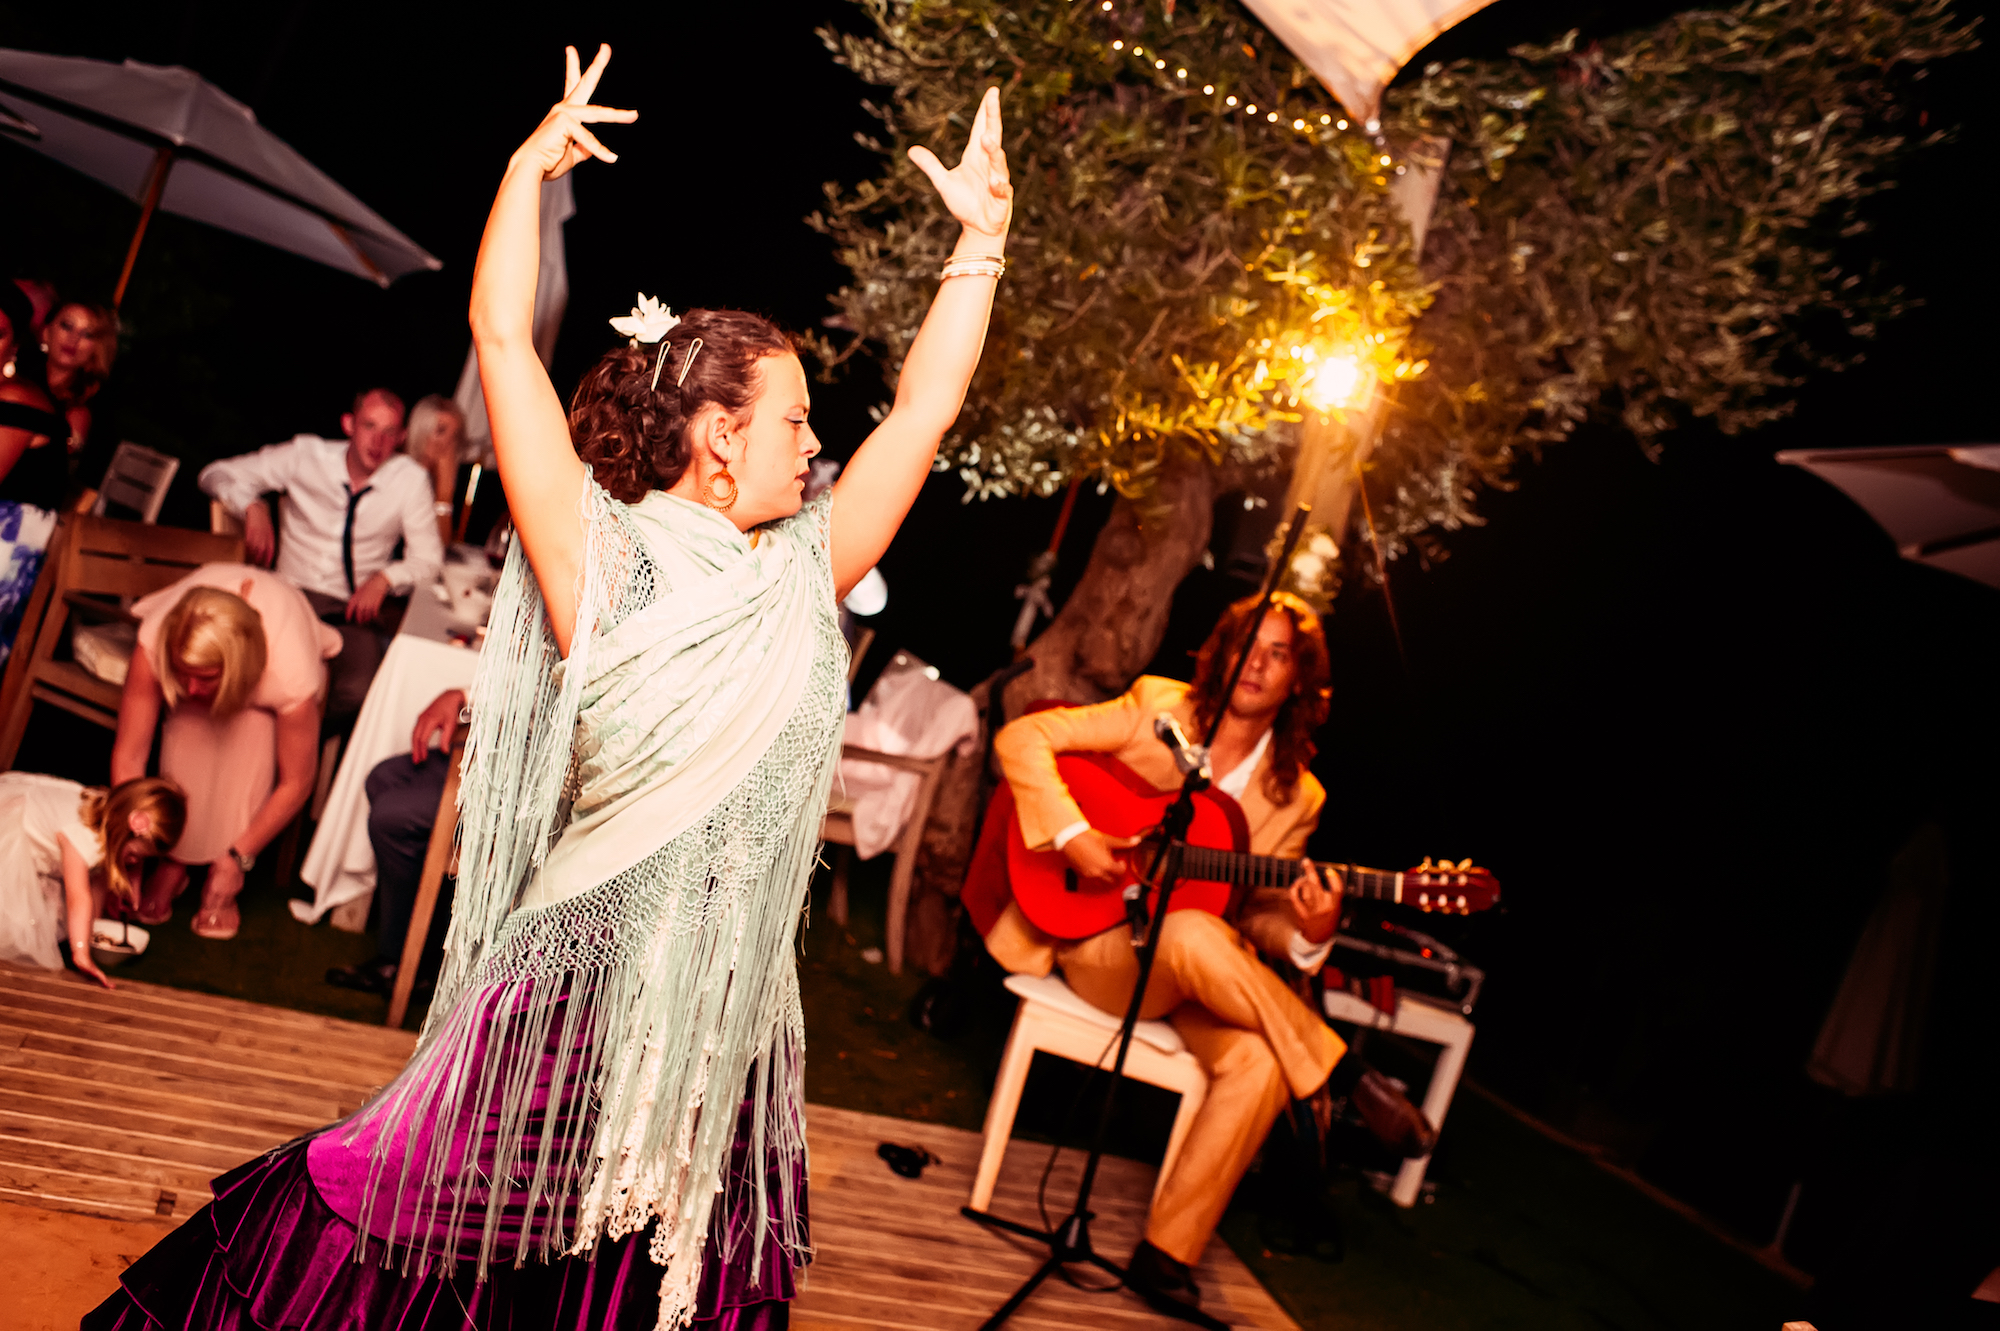 Spanish Wedding Guitarist | Live Wedding Reception Music